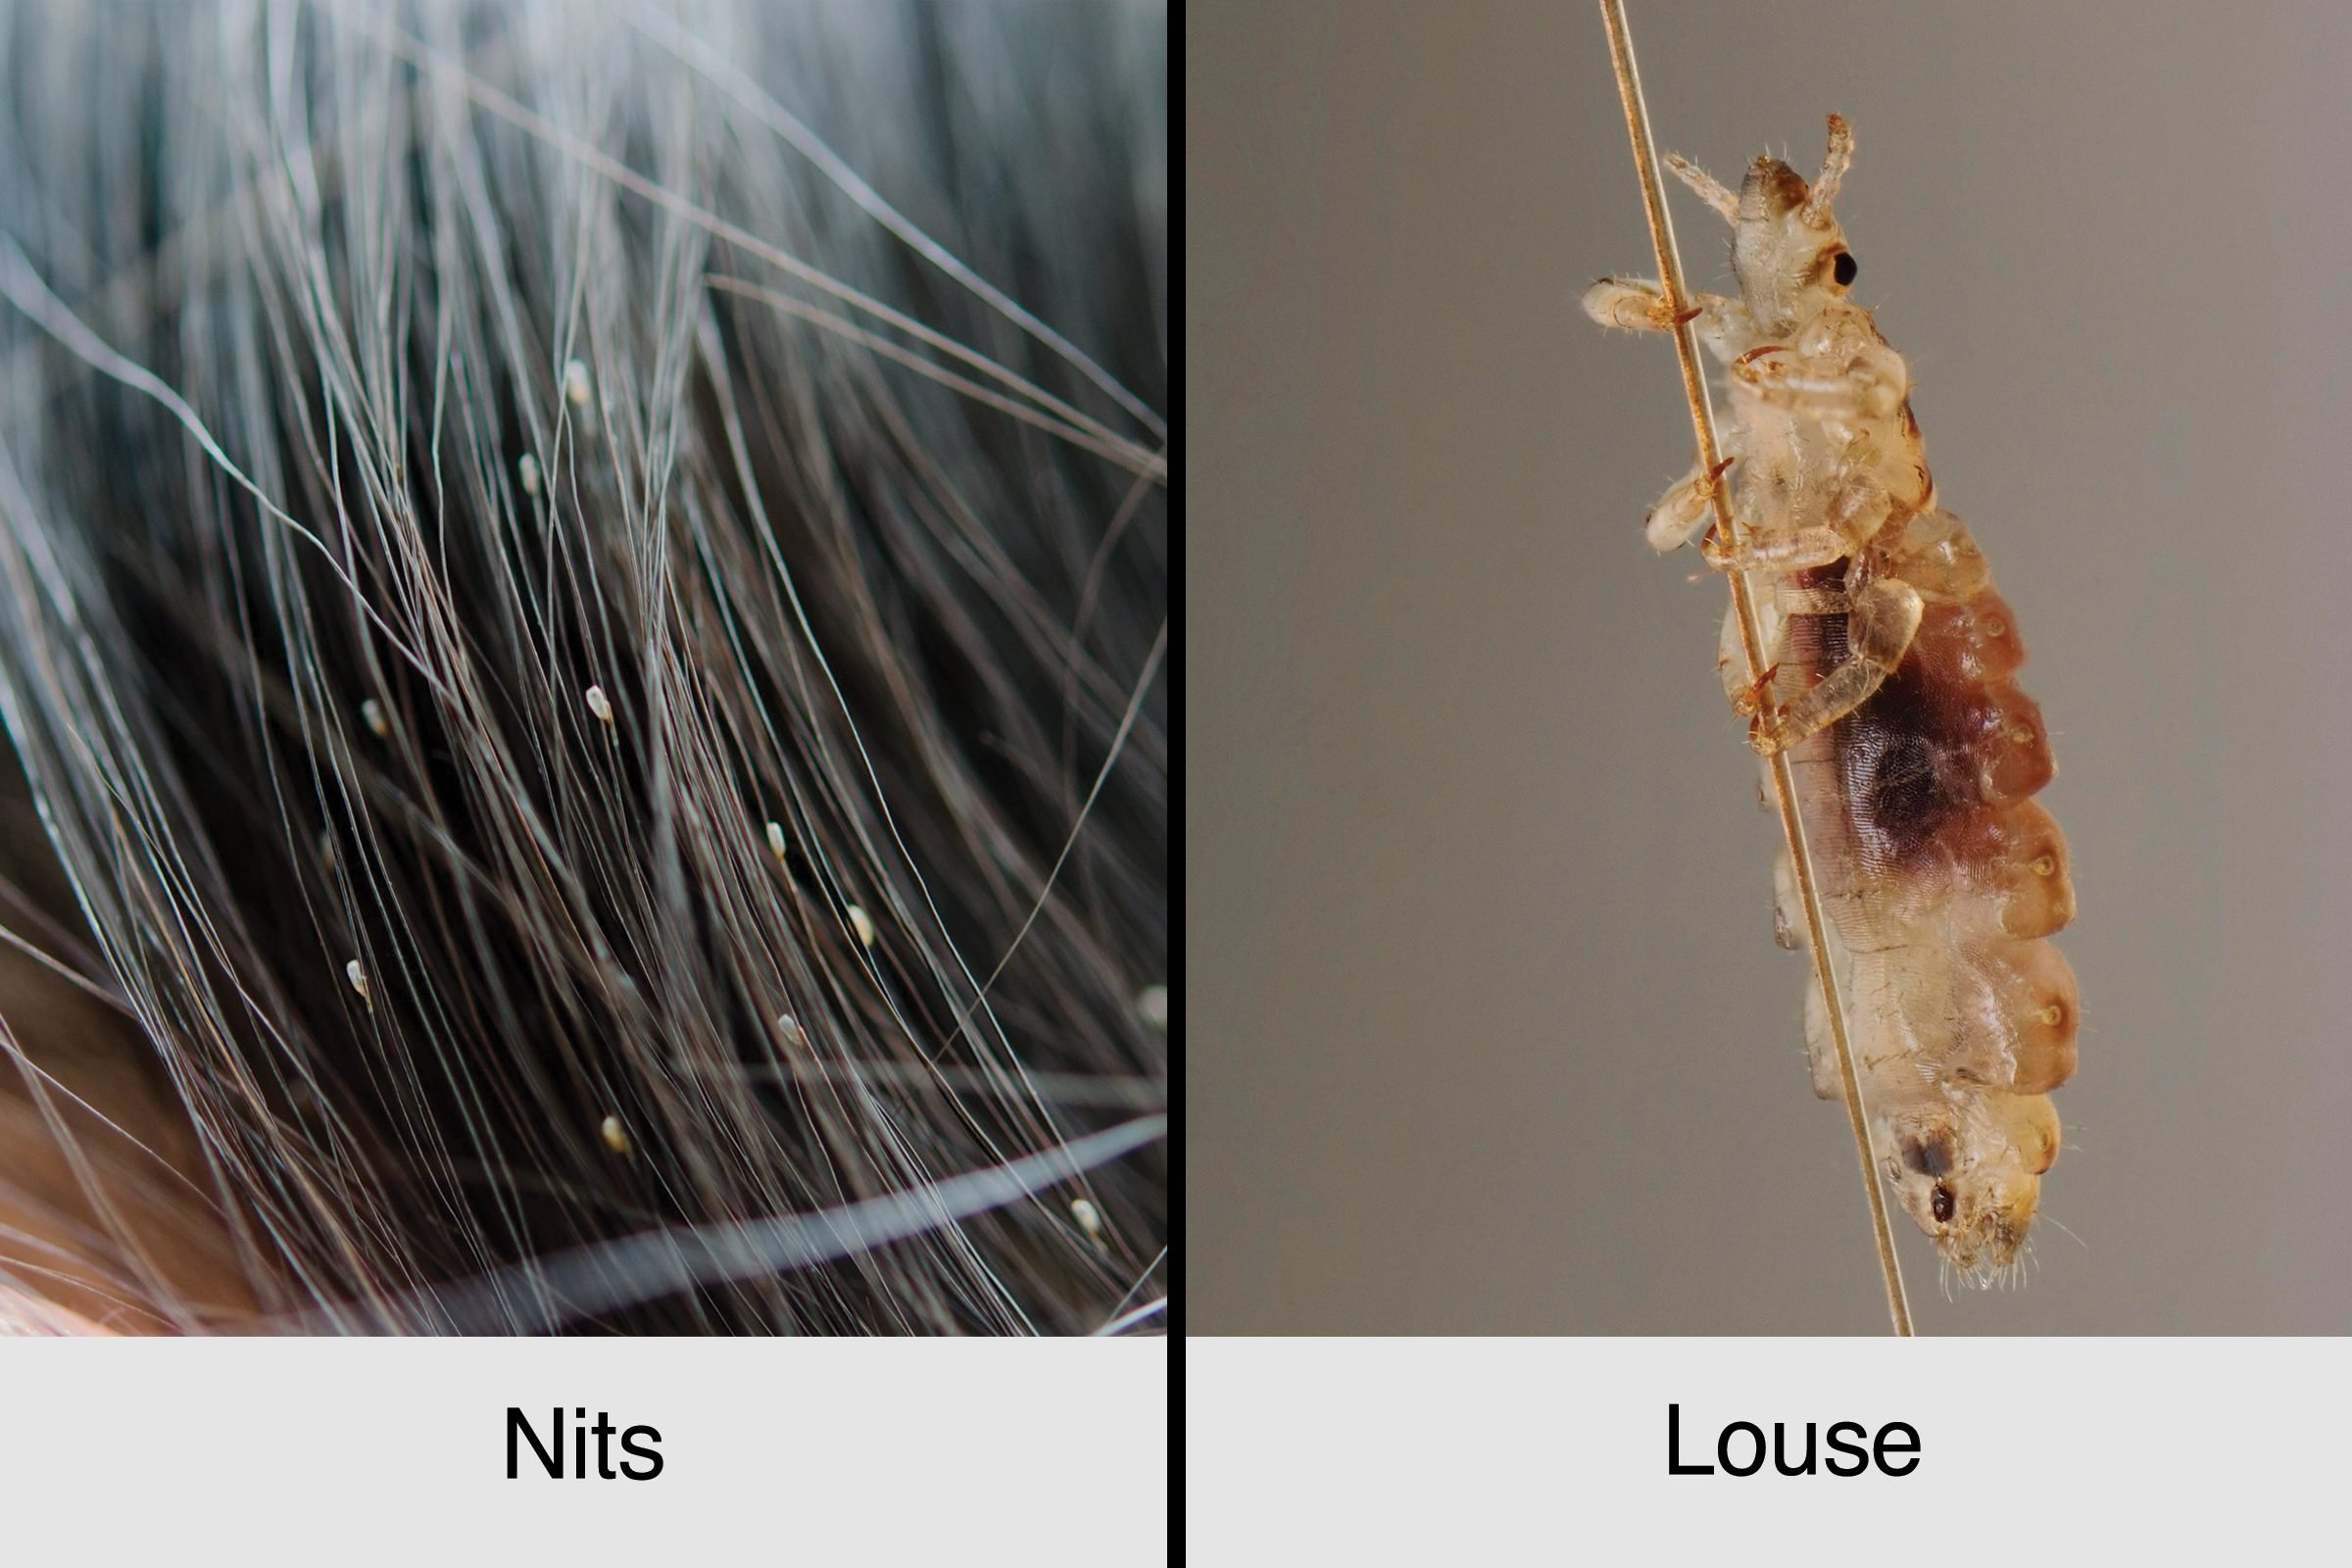 head lice nits vs louse